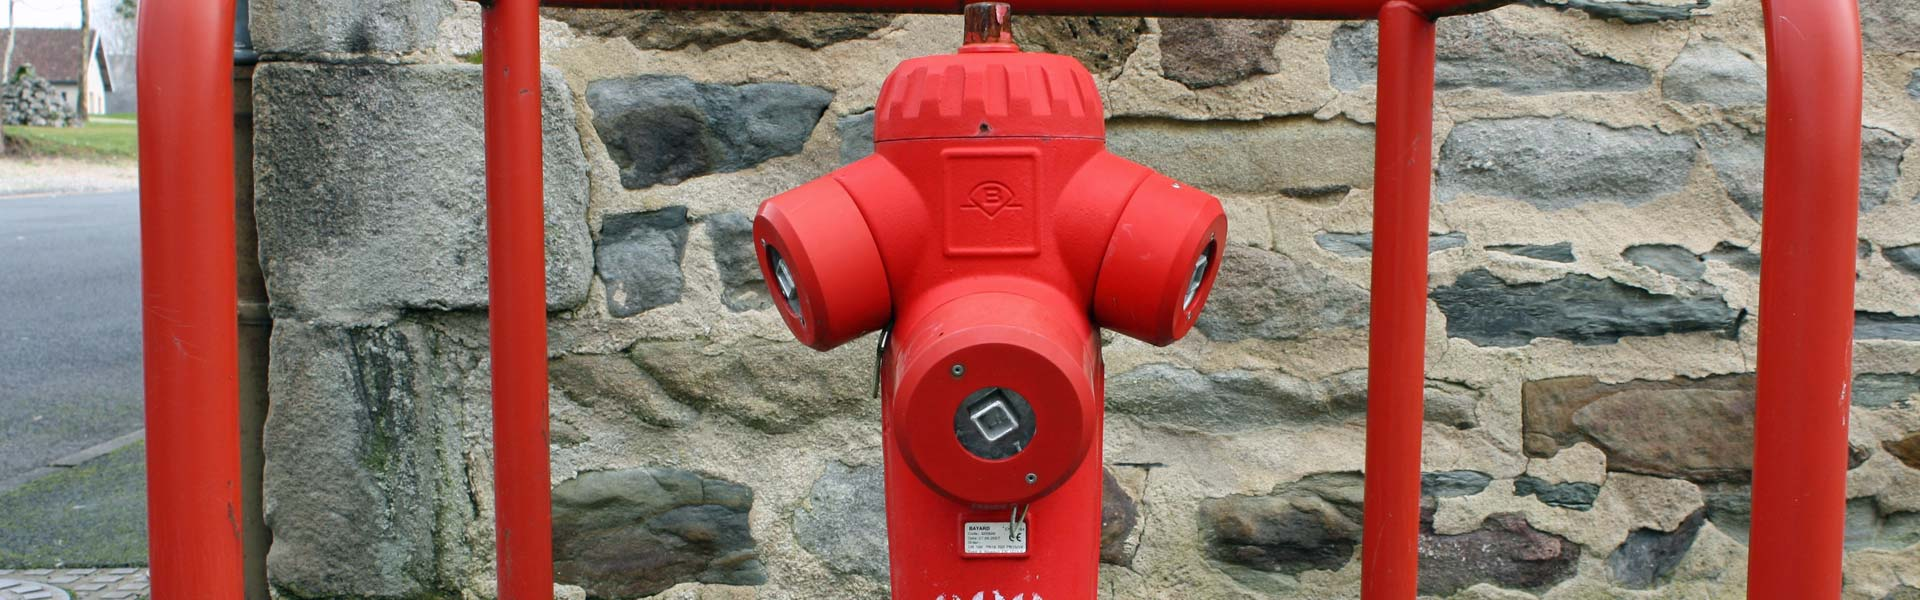 fugas de agua en sistemas contra incendios pci